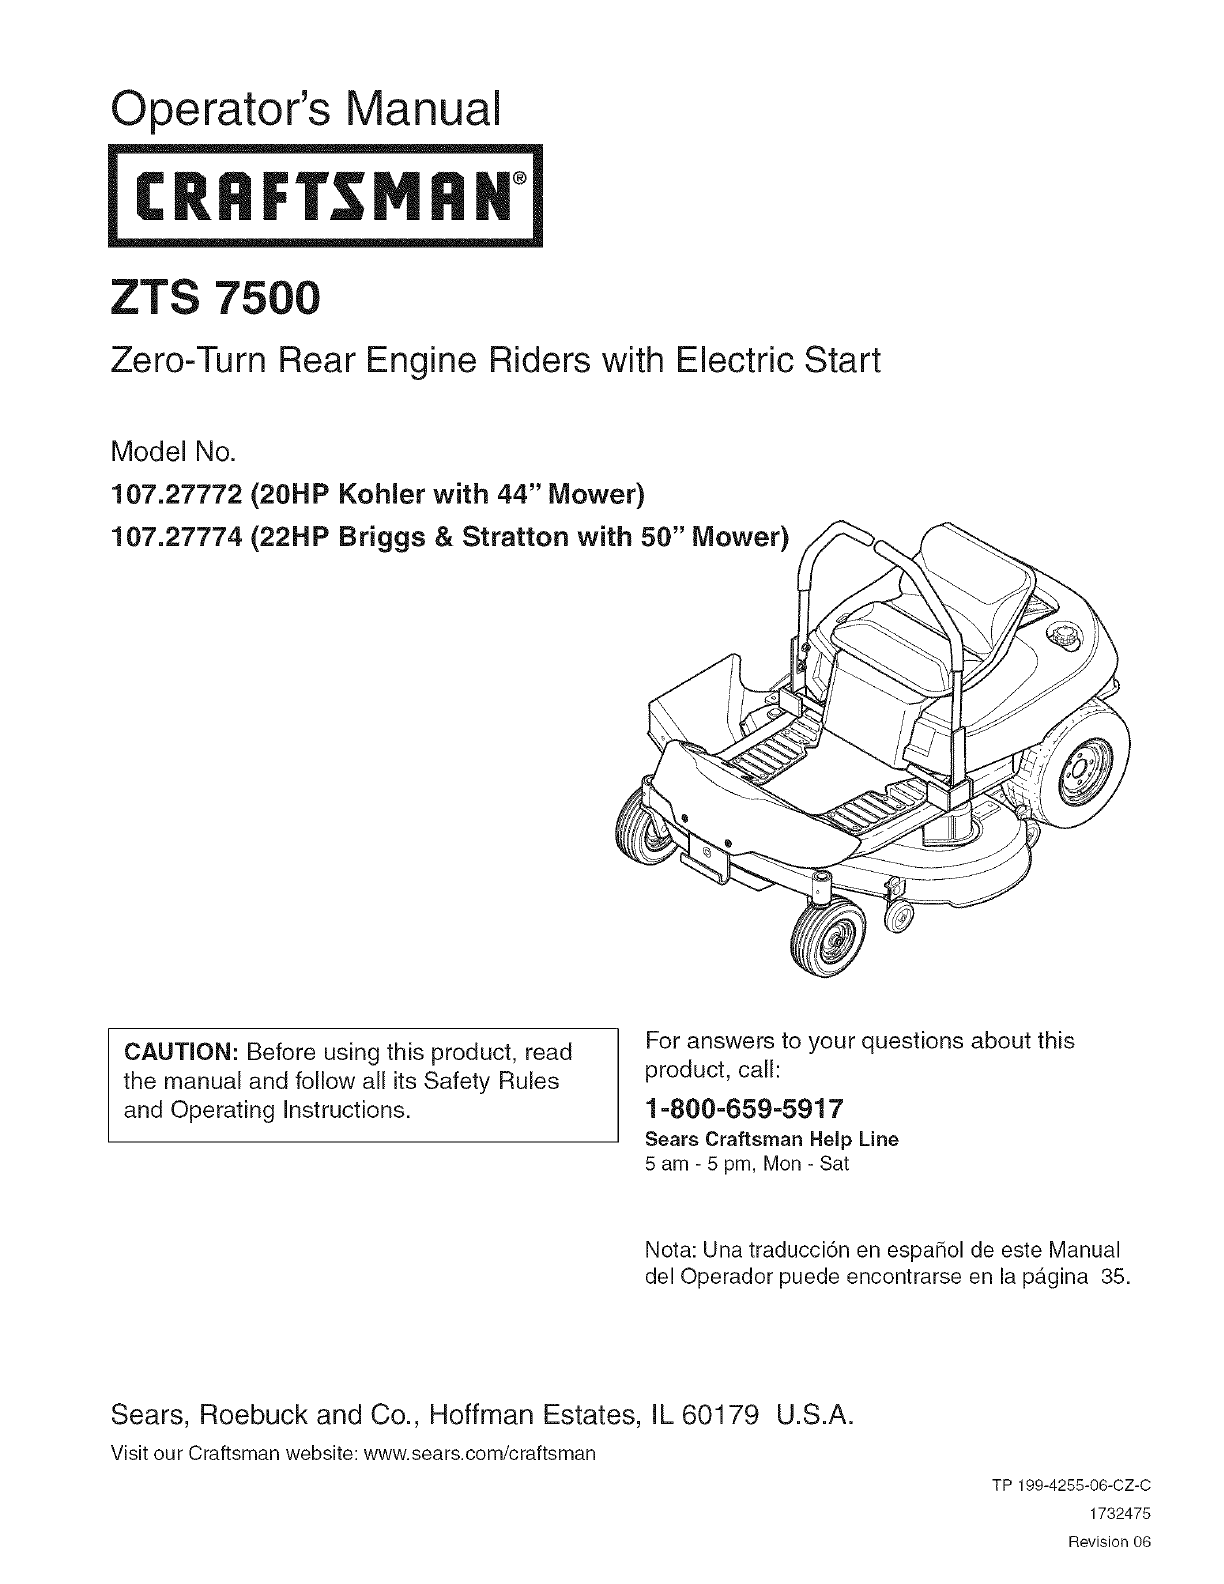 craftsman ezt manual